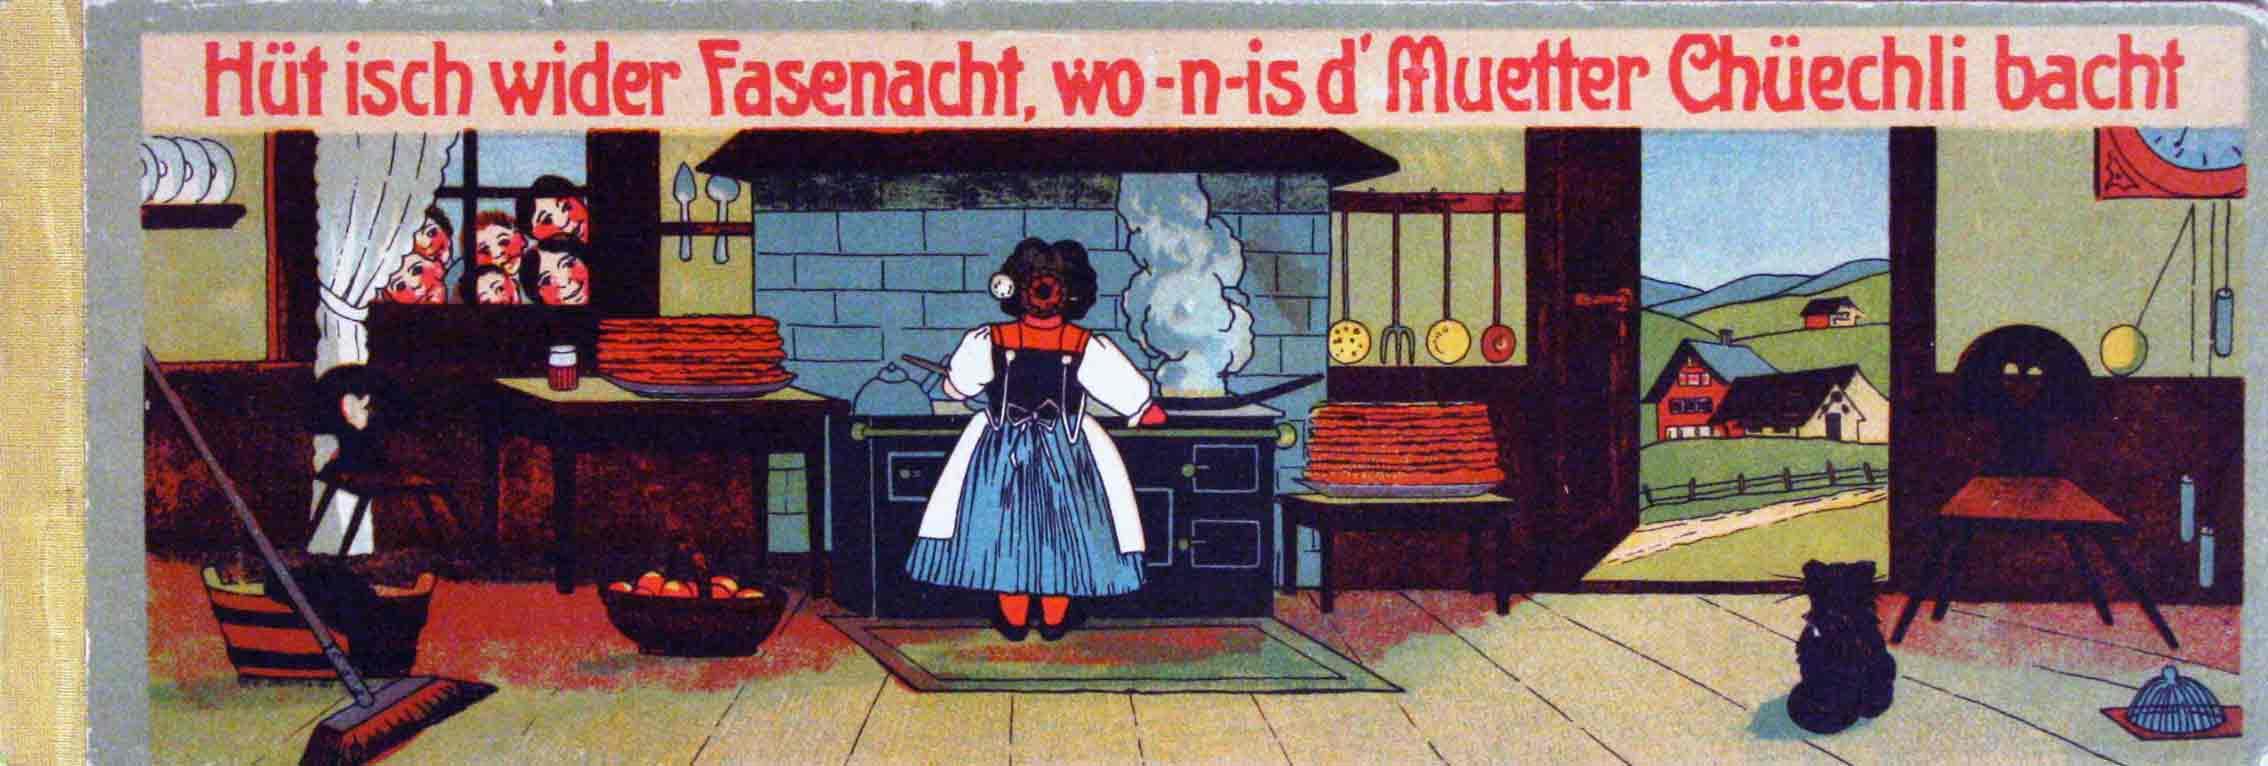 WENGER, LISA (1858-1941): - Hüt isch wider Fasenacht, wo-n-is d'Muetter Chüechli bacht. Ein Bilderbuch mit 15 farbigen Tafeln nebst Text.